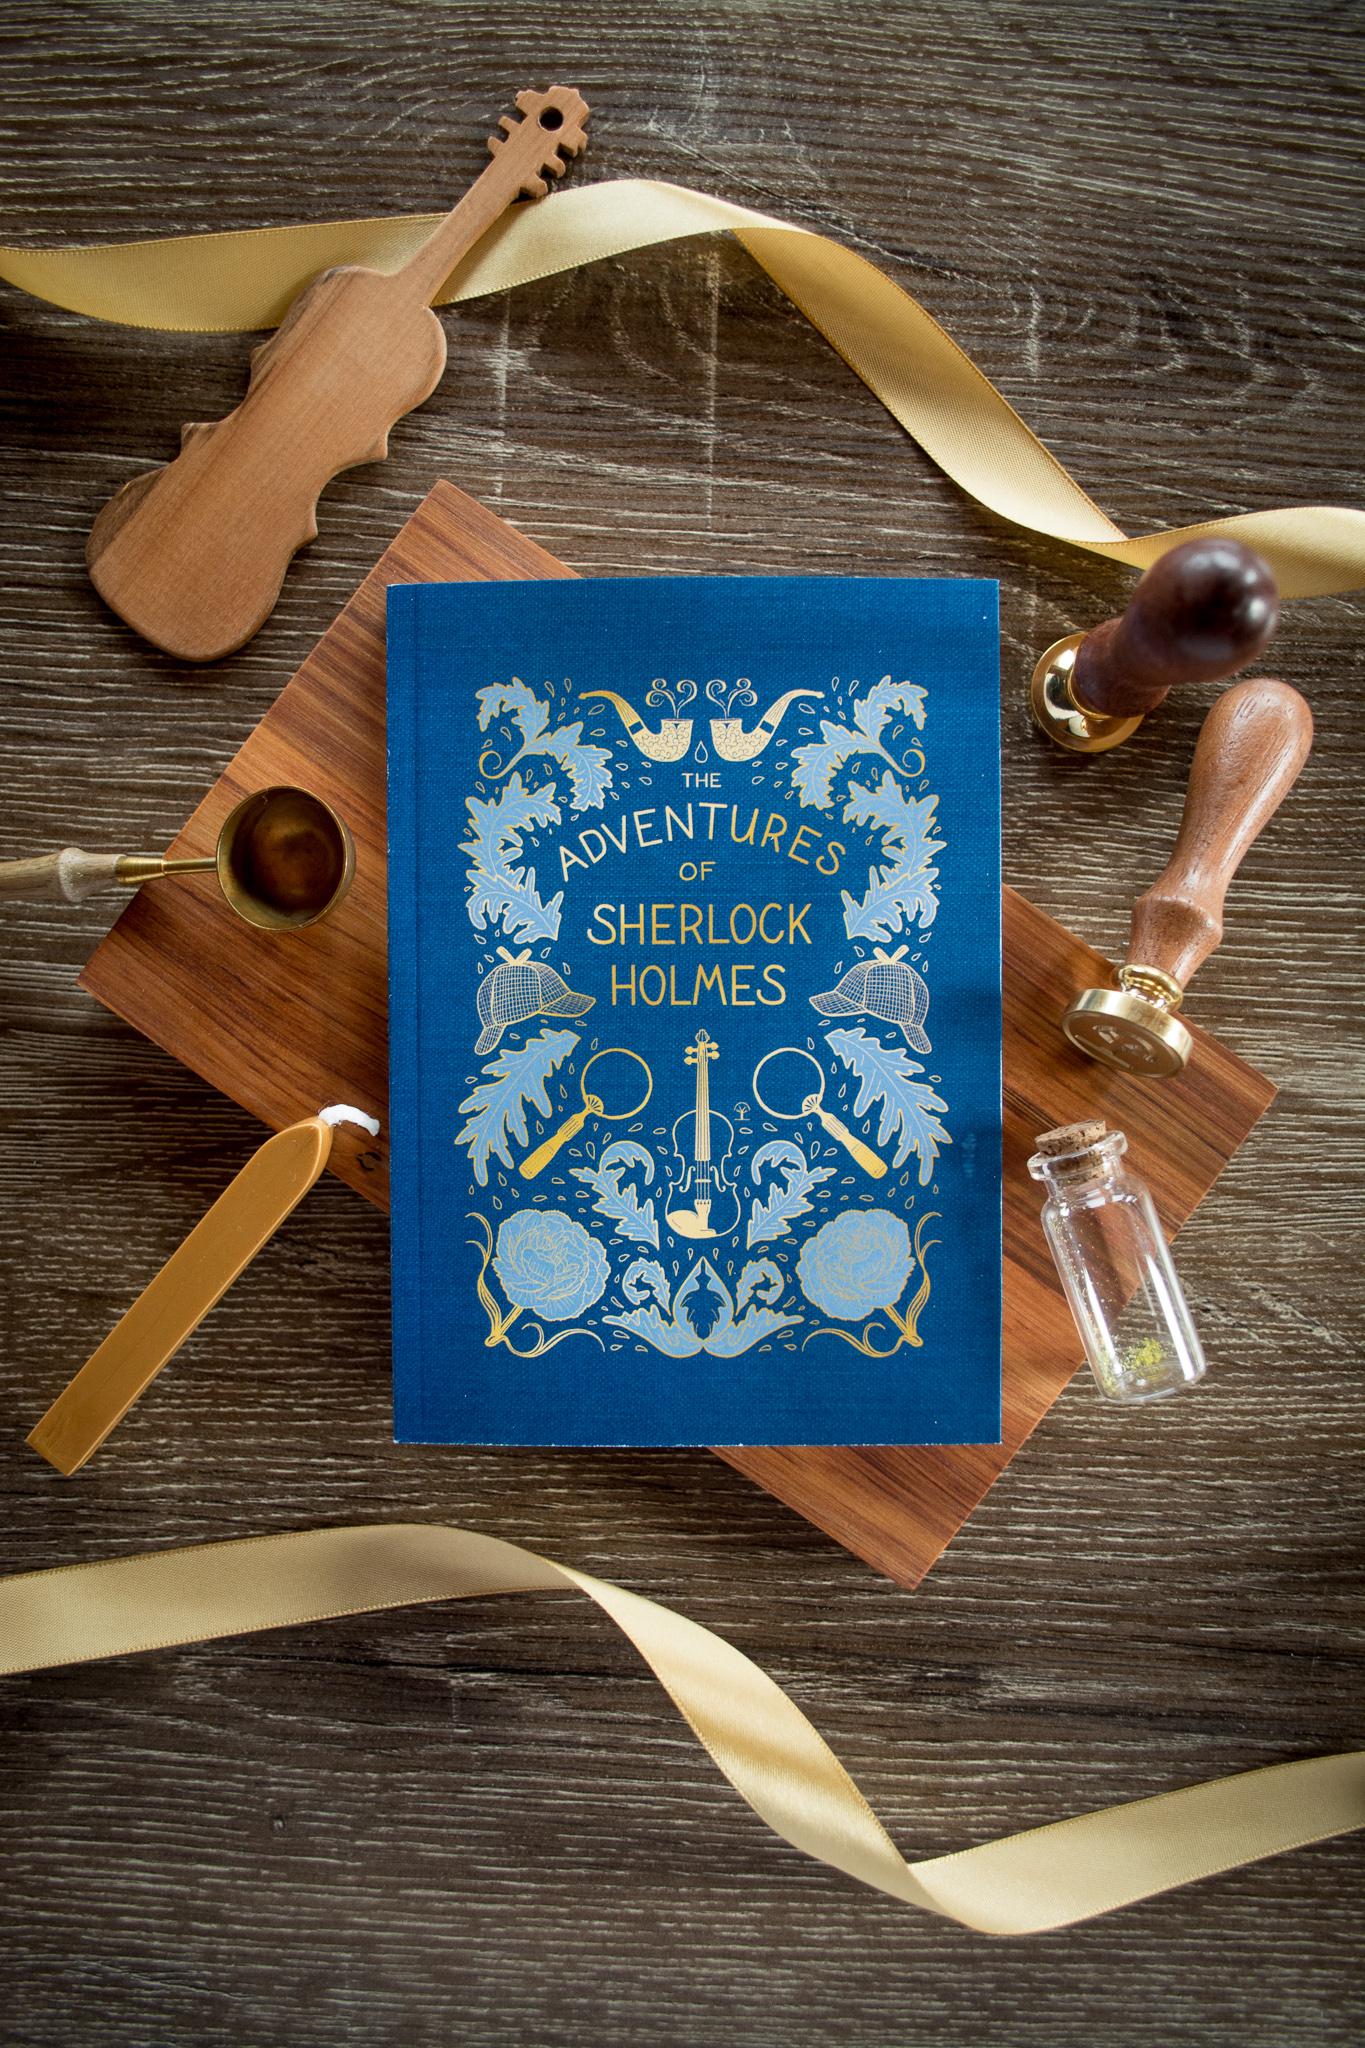 sherlock_holmes_book_cover_notebook_holly_dunn_design.jpg